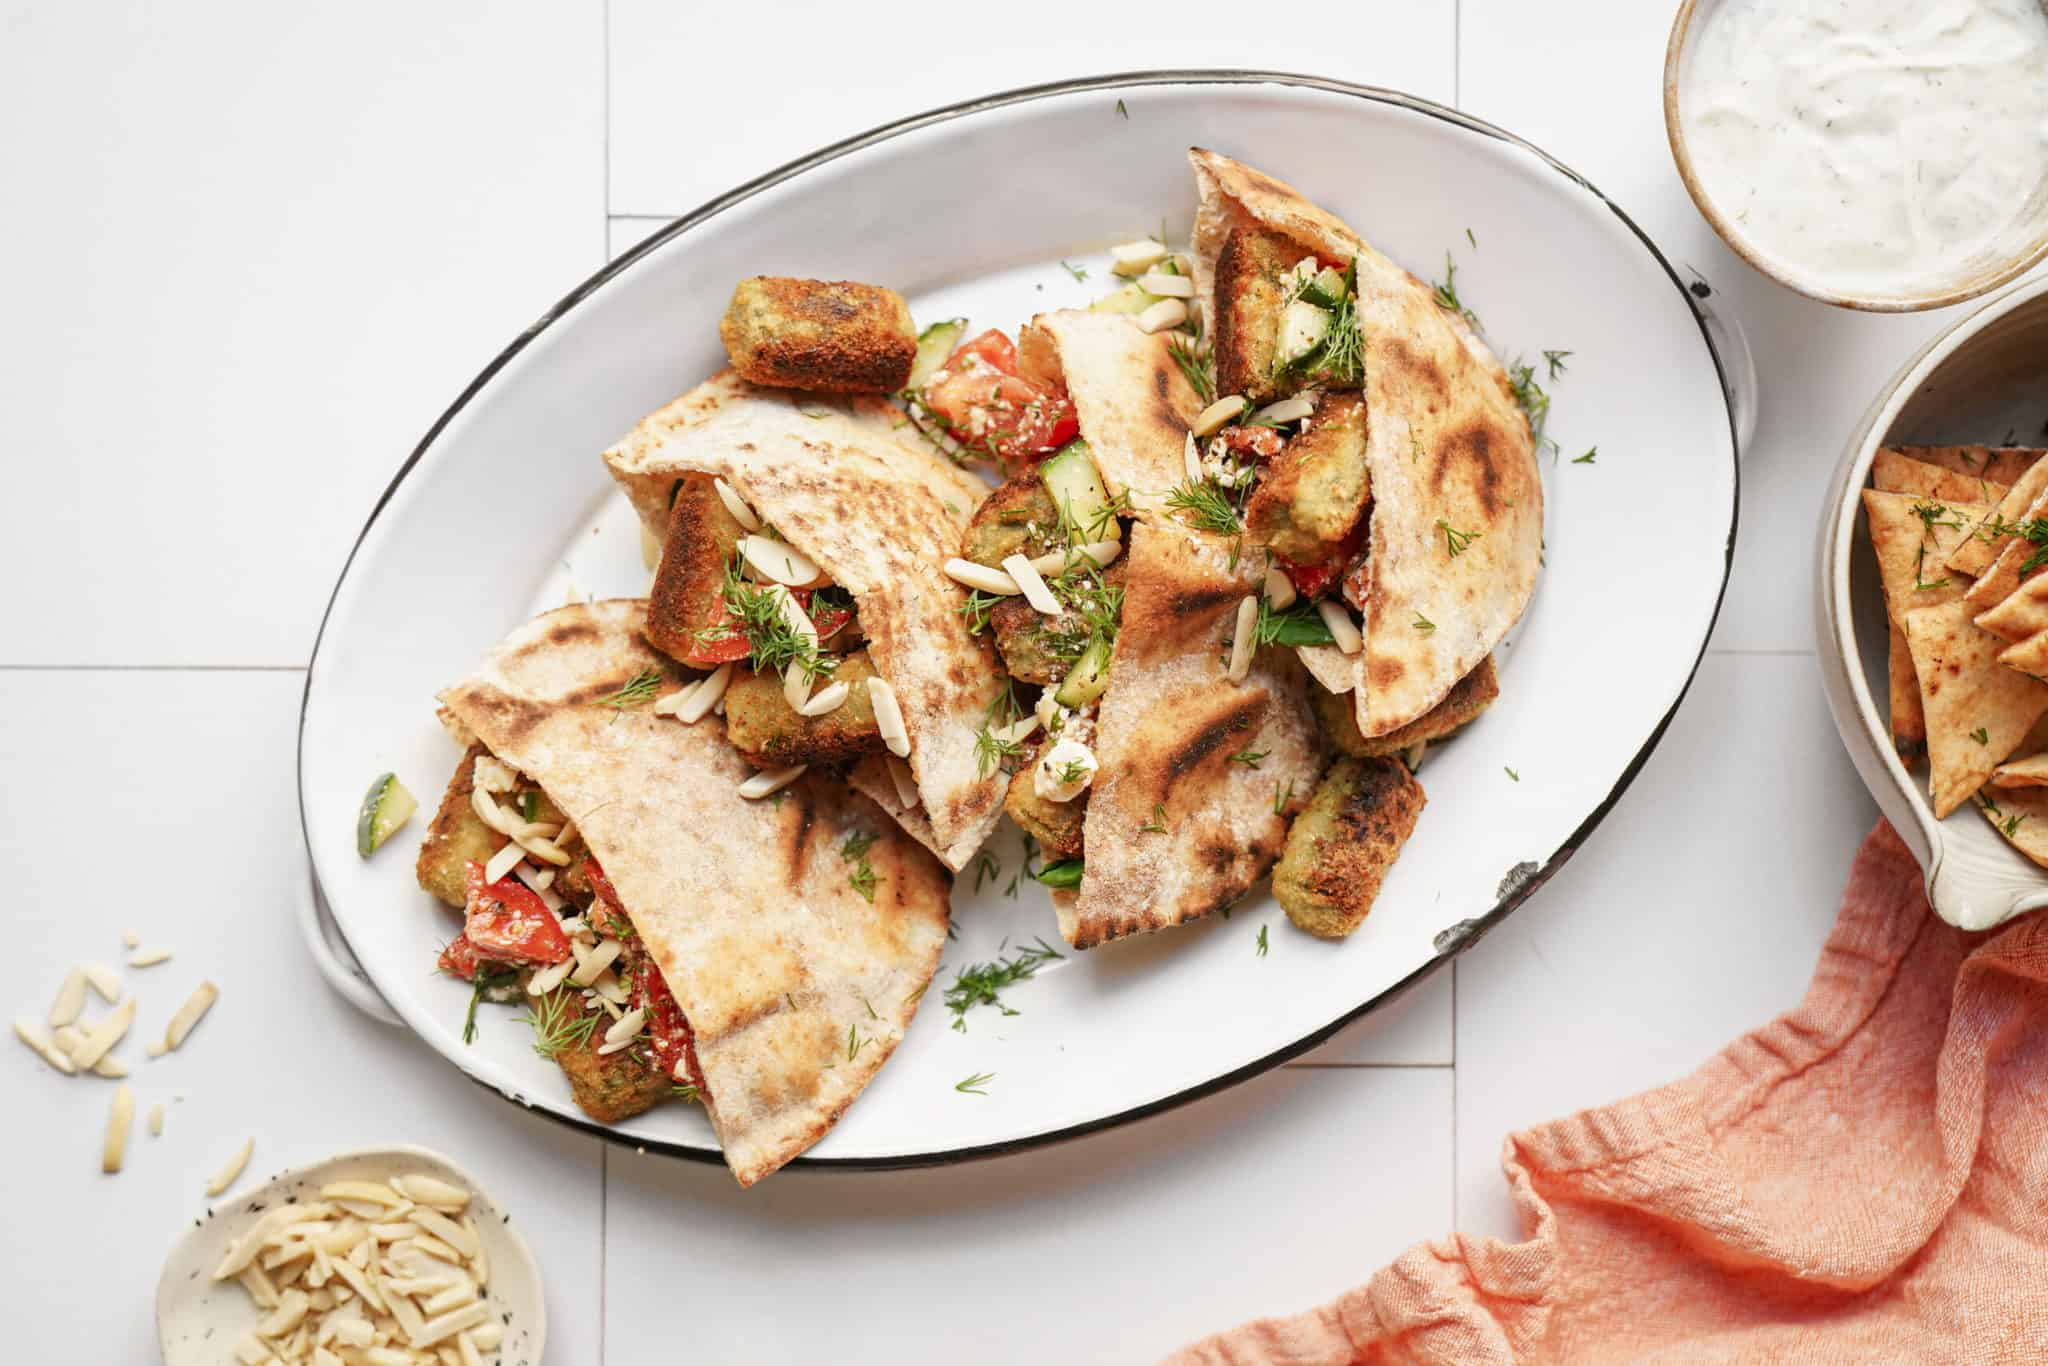 Mediterranean wrap on white plate